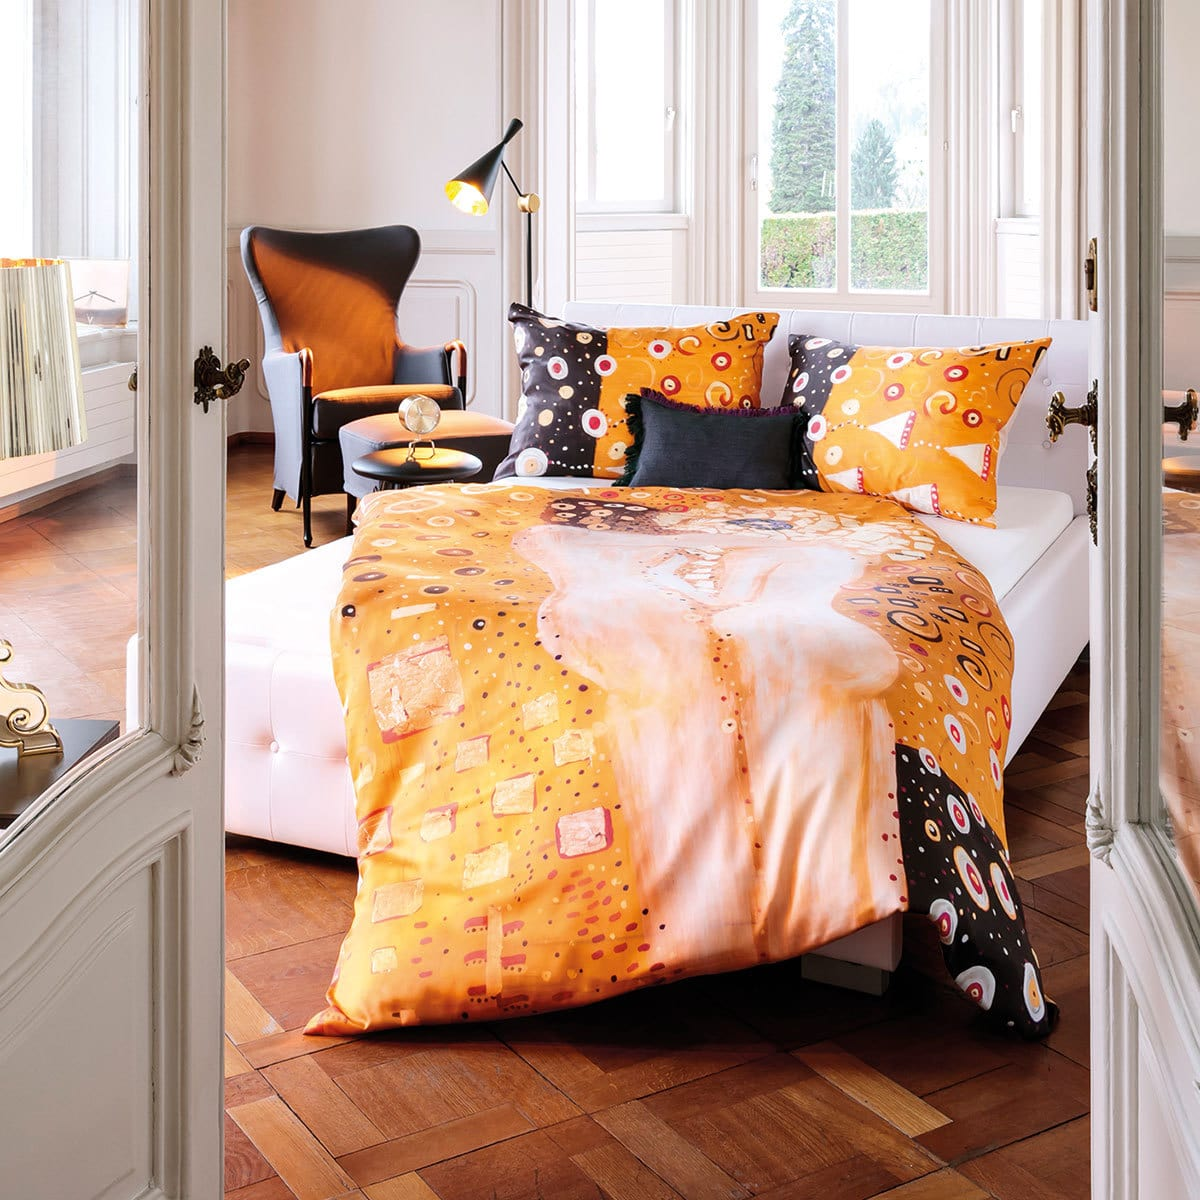 hefel tencel wendebettw sche pure luxury the kiss g nstig online kaufen bei bettwaren shop. Black Bedroom Furniture Sets. Home Design Ideas